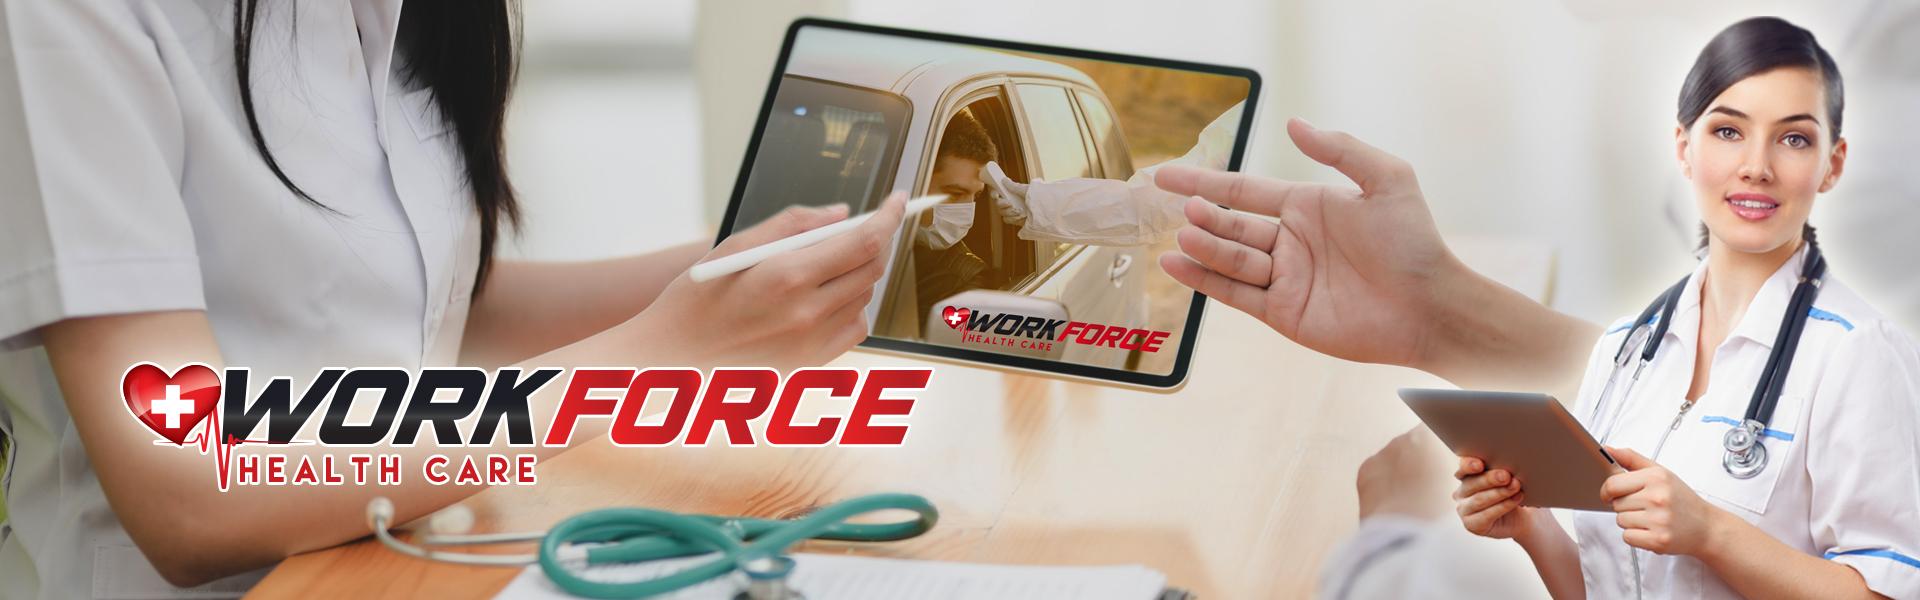 Workforce Enterprises - Banner Health Care